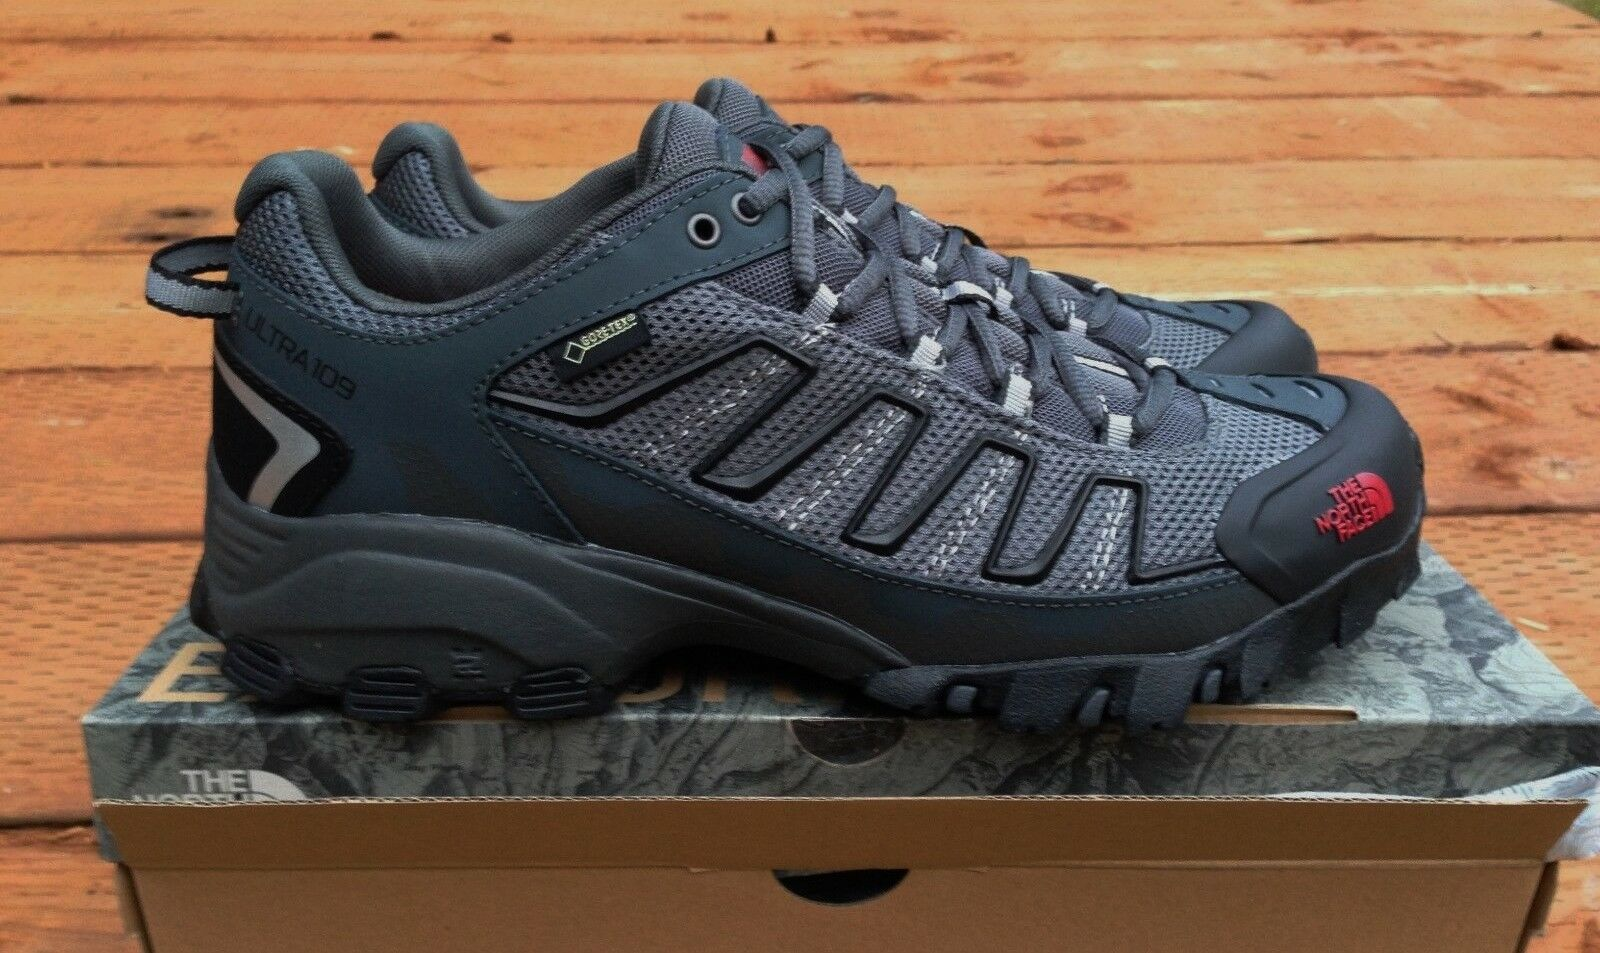 Para Hombre THE NORTH ULTRA 109 bajo GTX GORE FACE-Zapatos Trail Hiking correr TEX Excursionistas